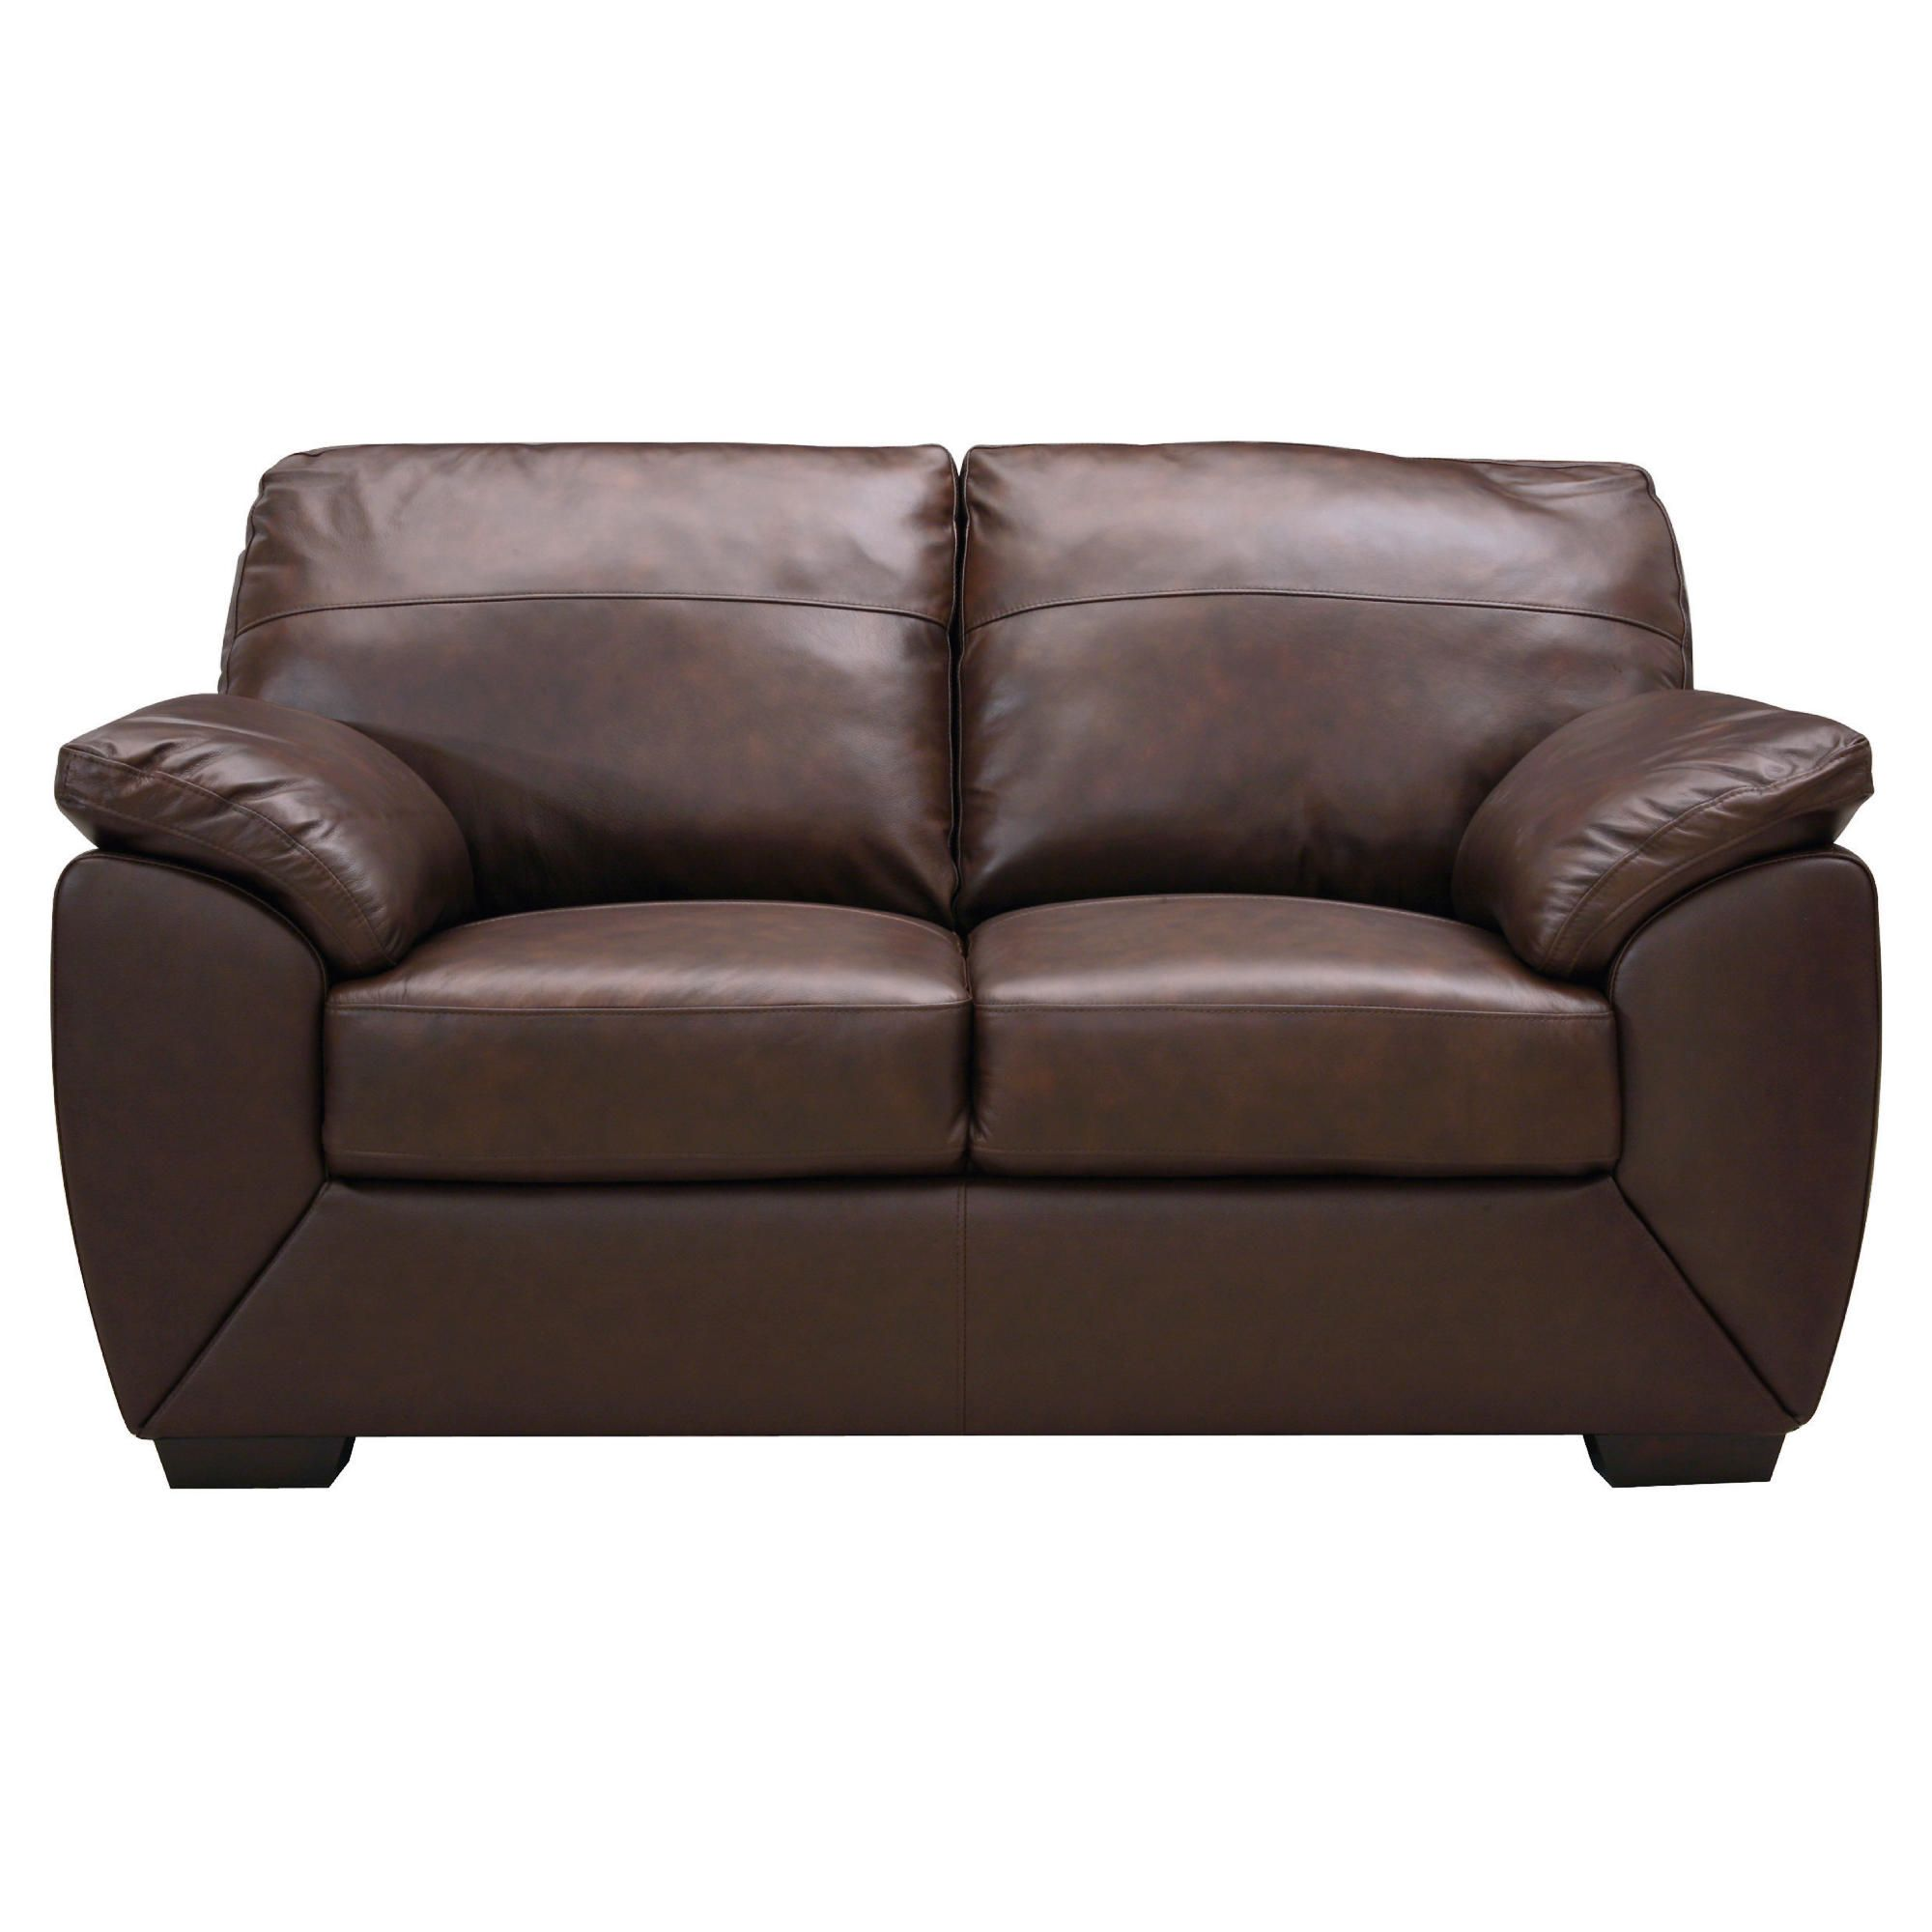 Alberta Small Leather Sofa, Chocolate at Tesco Direct